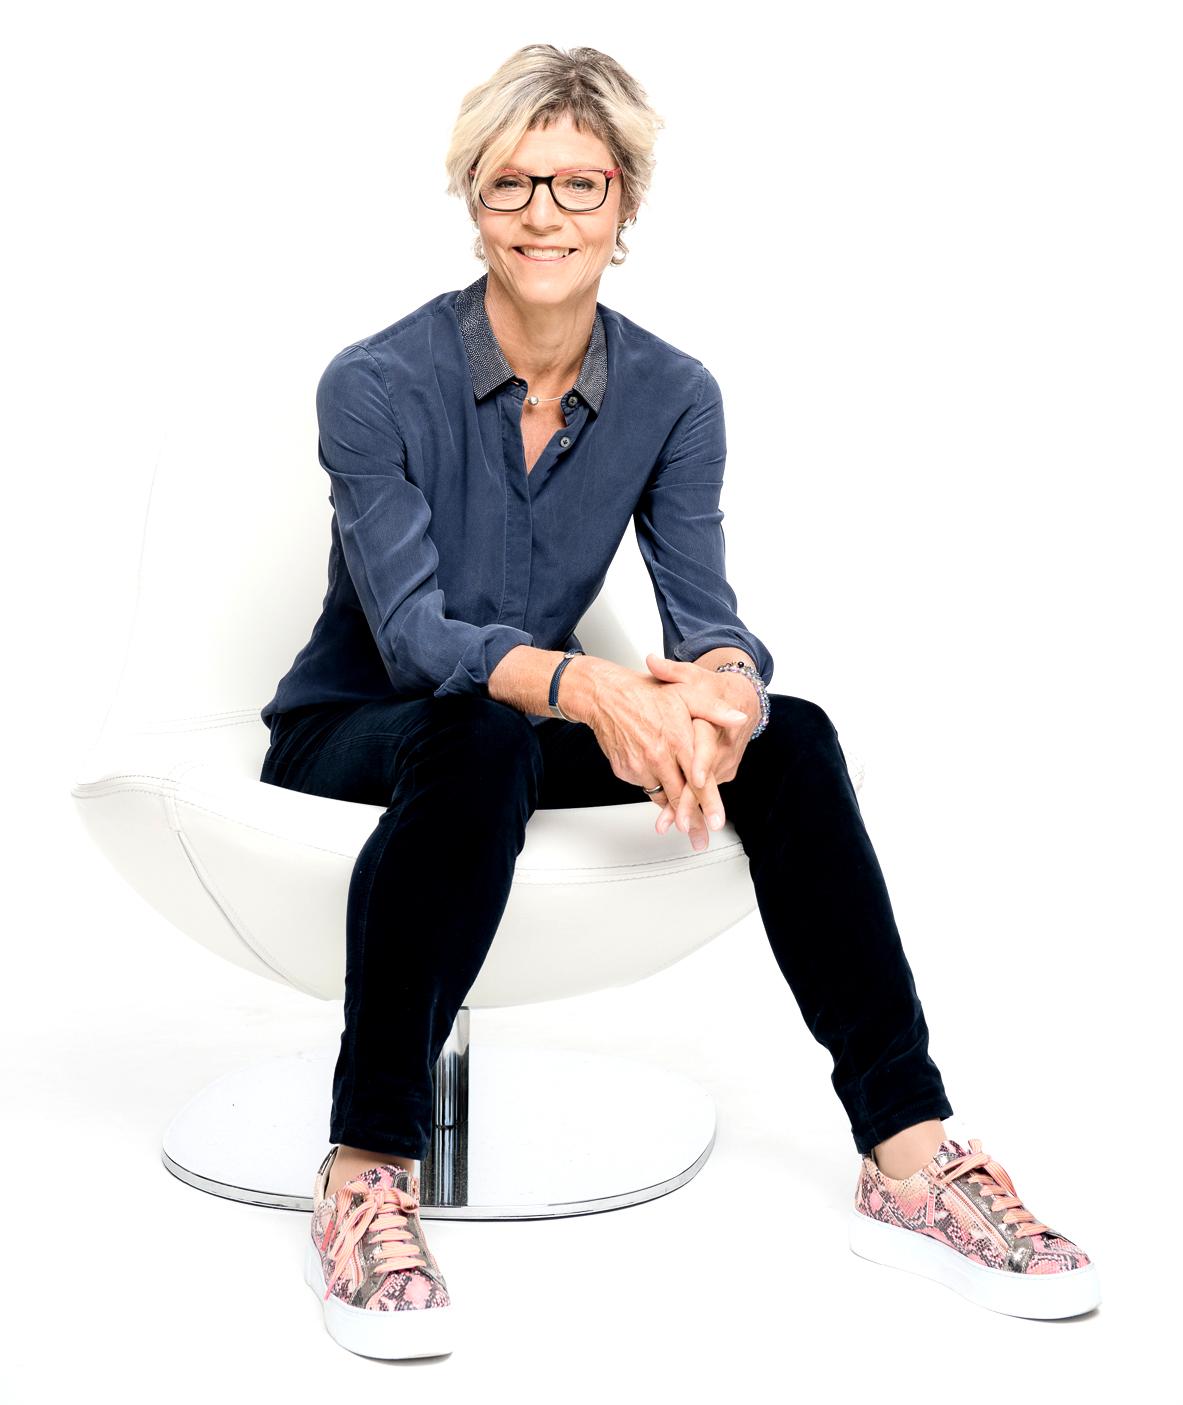 Maja Sigg Consulting | eidg. dipl. Experting in Rechnungslegung und Controlling